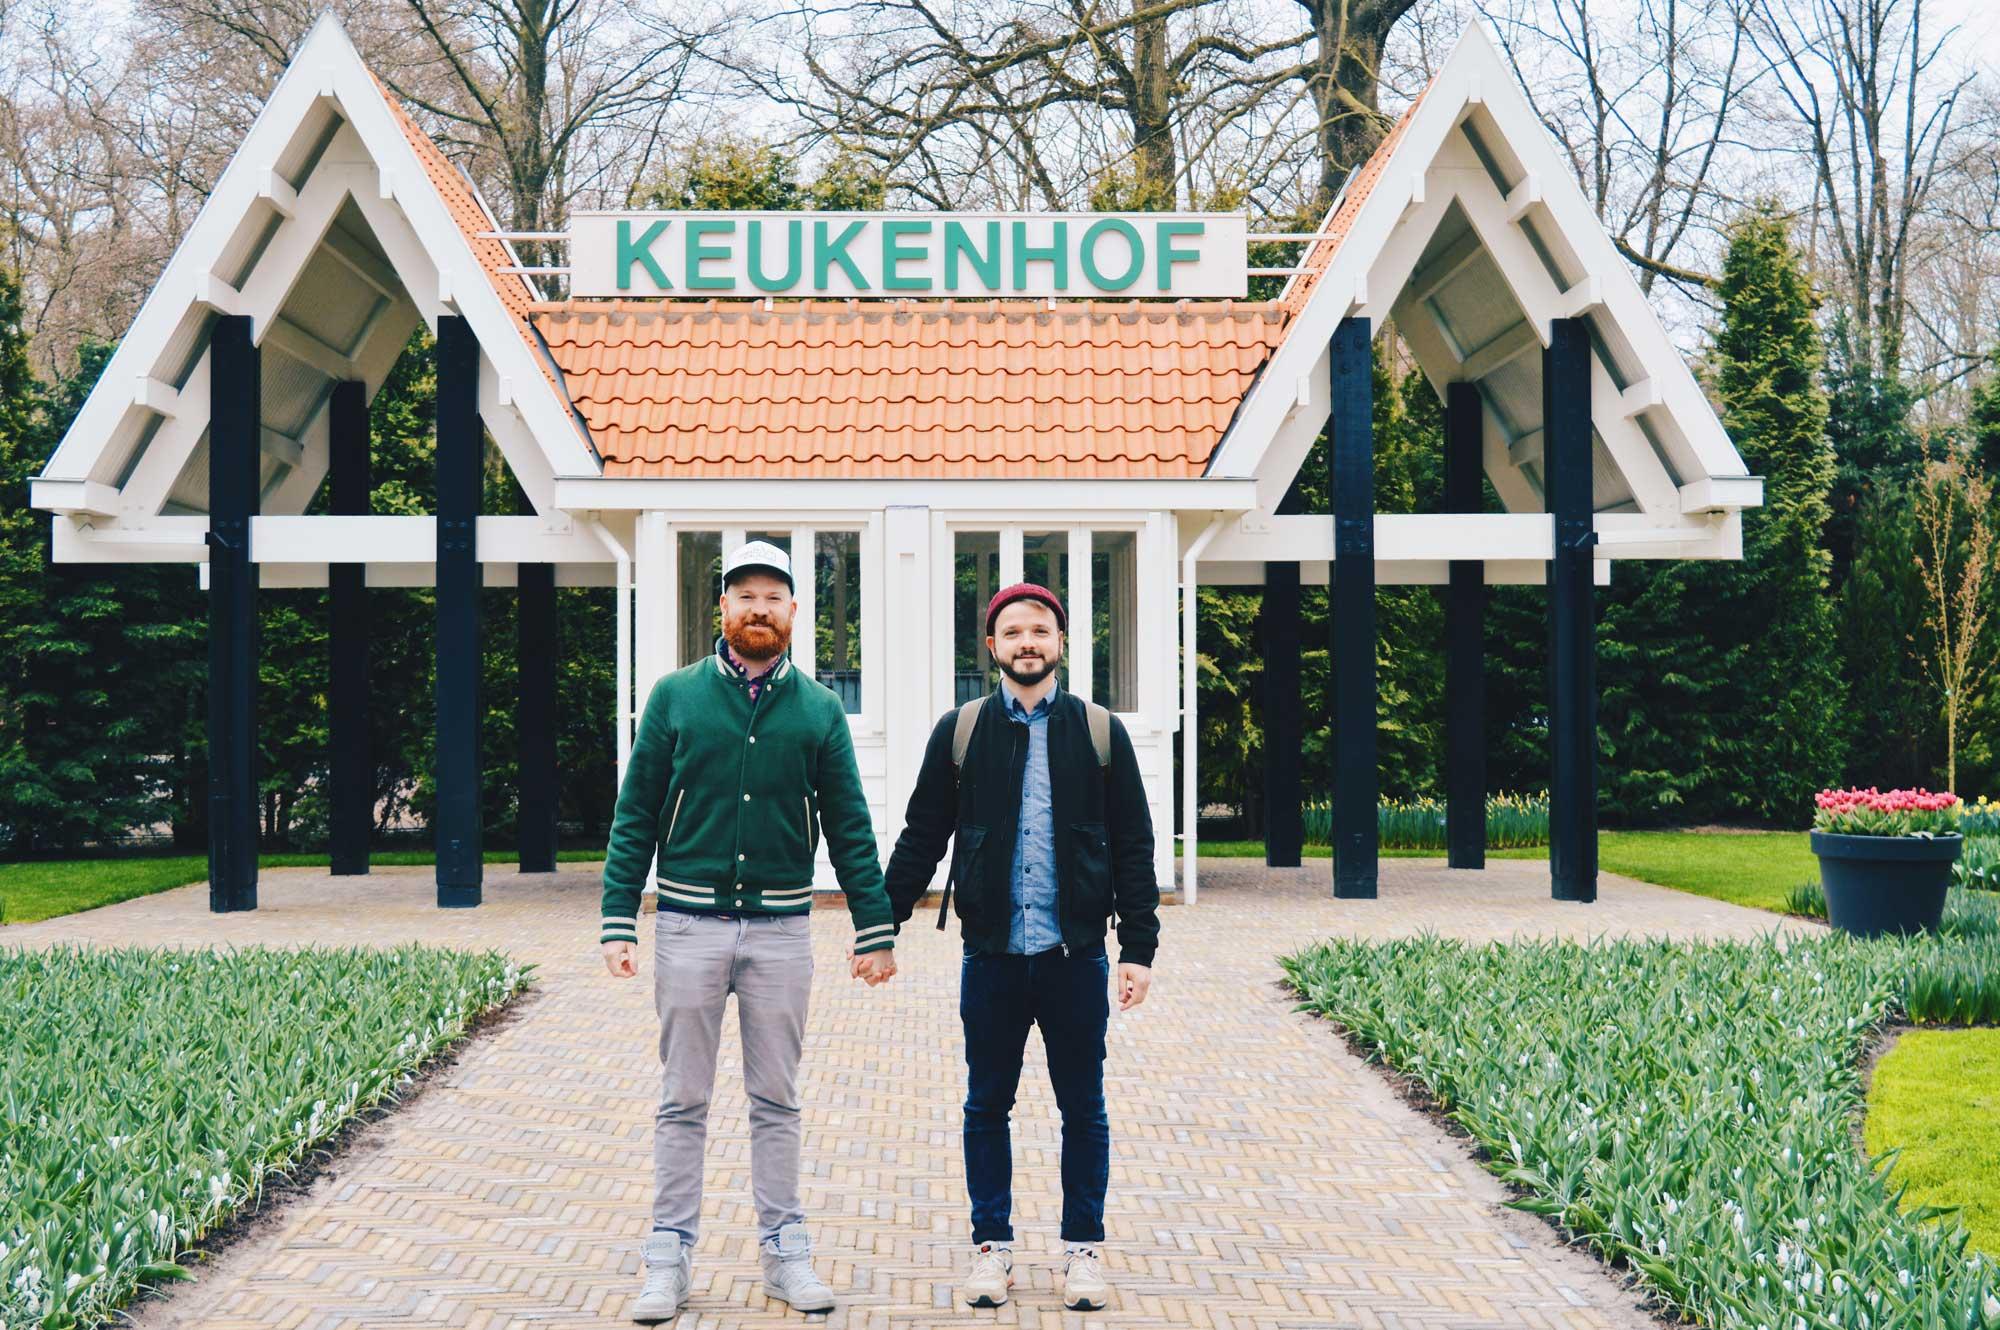 Portrait in front of the old entrance - monument   Keukenhof Tulip Blossom Holland © Coupleofmen.com